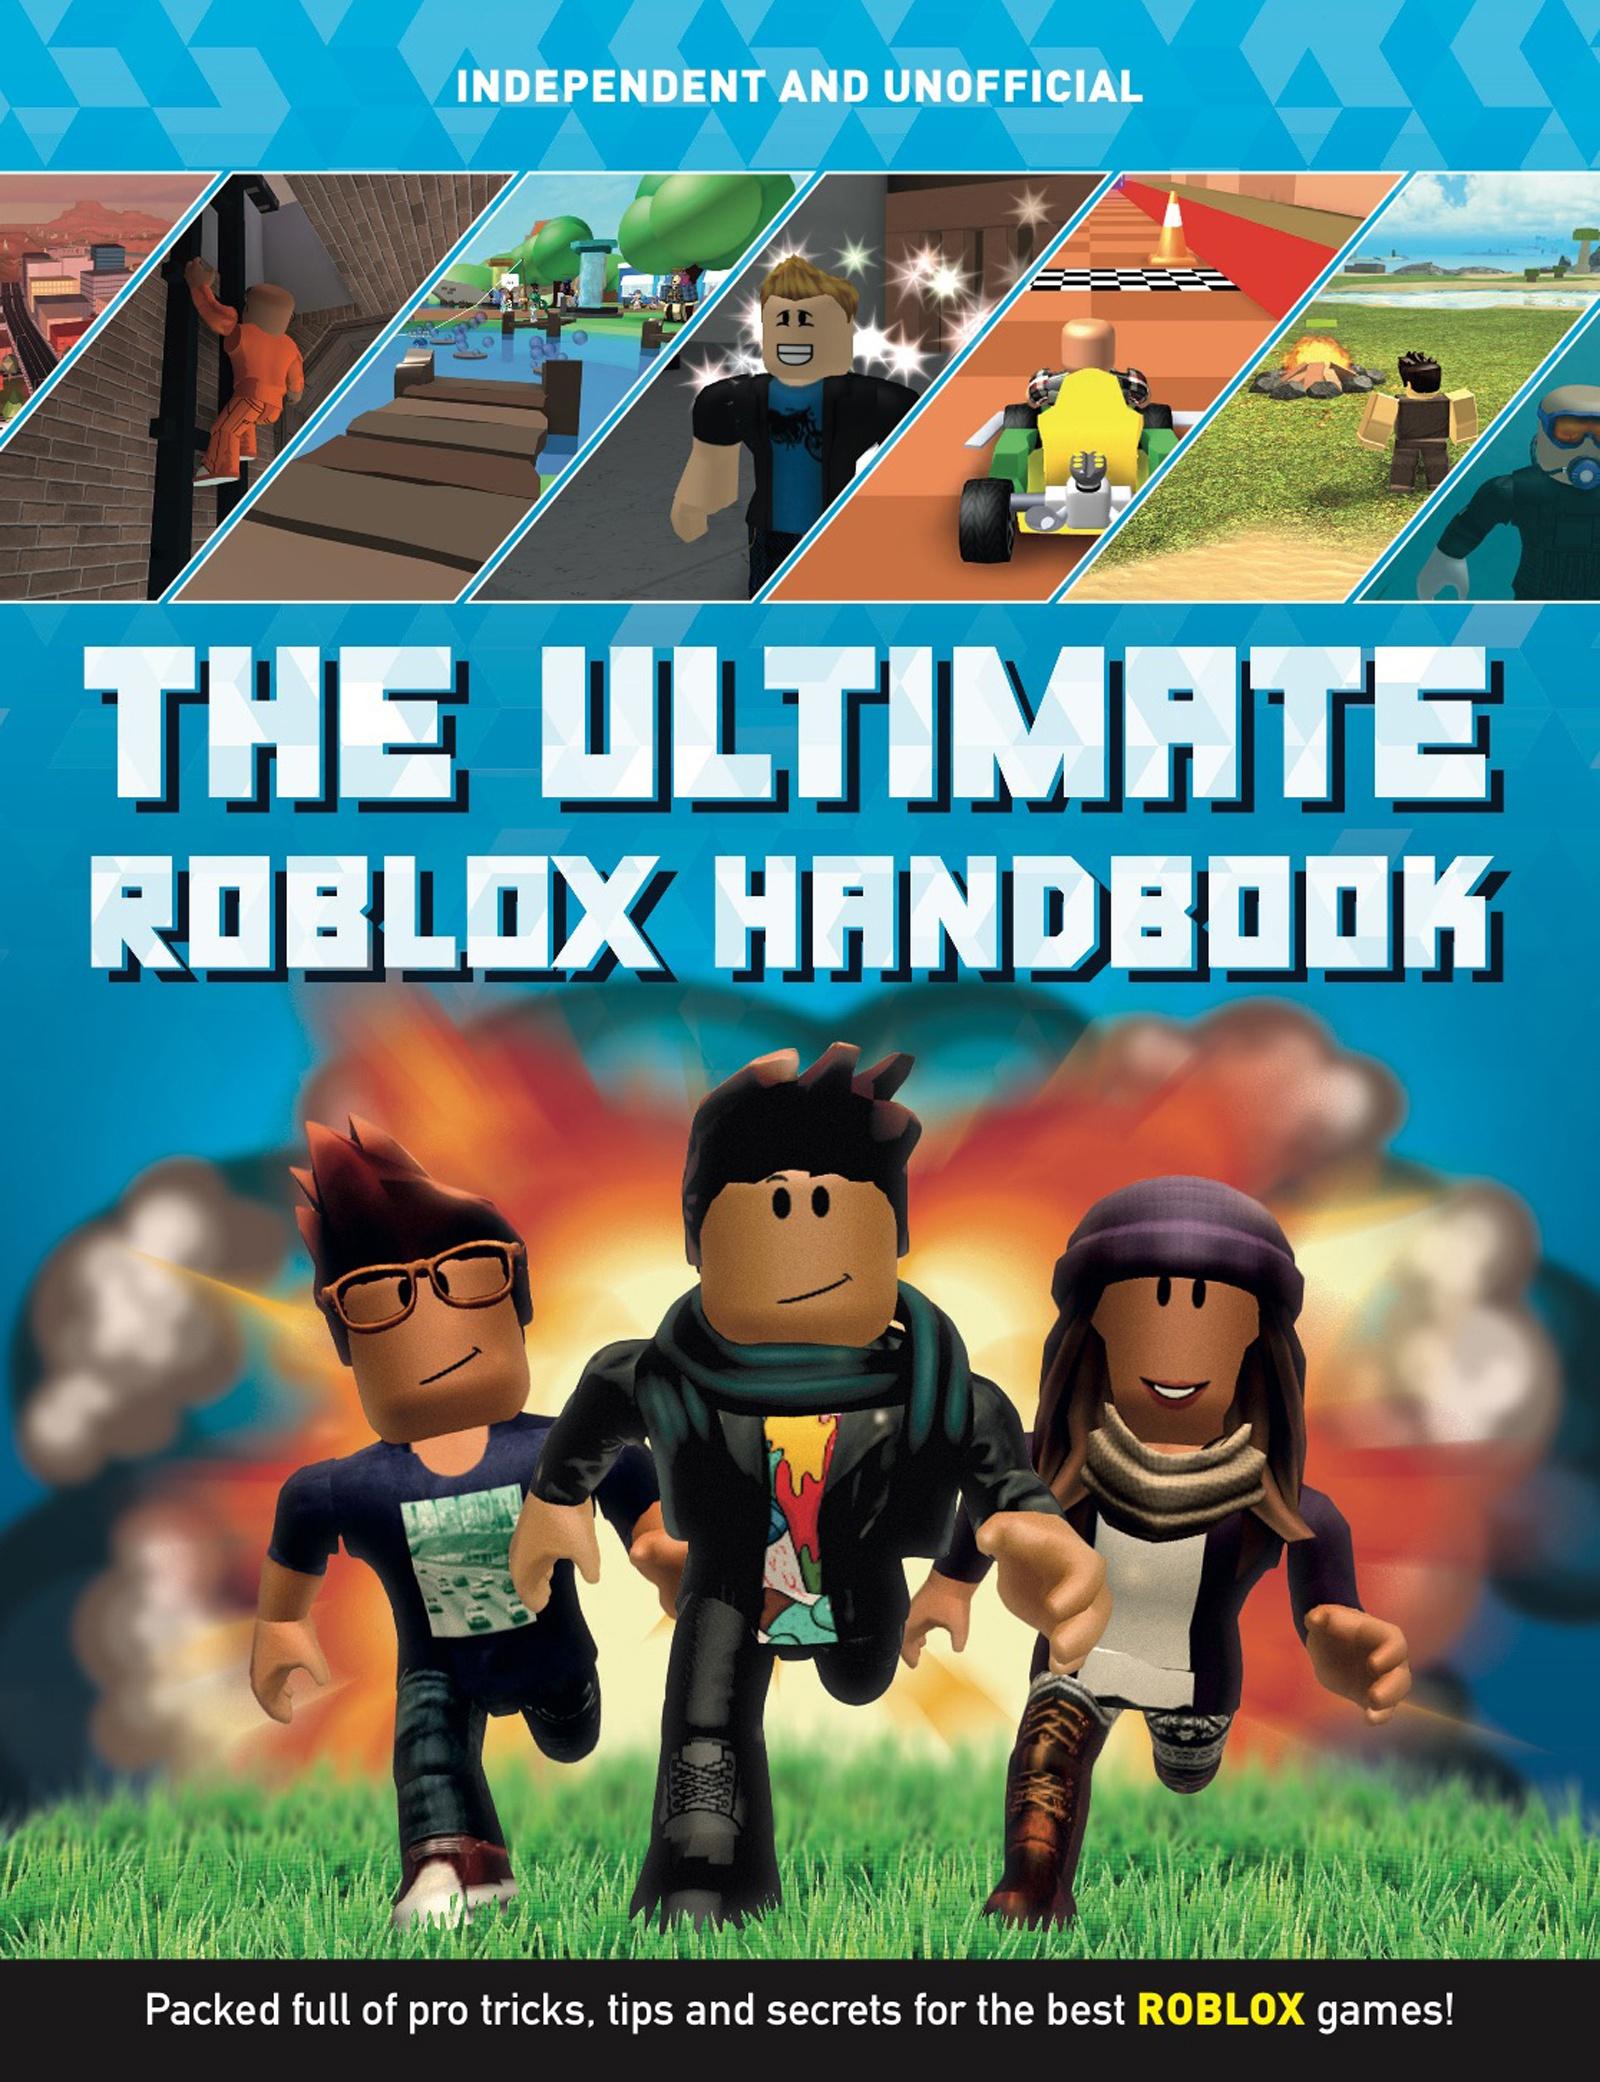 The Ultimate Roblox Handbook Kevin Pettman 9781787393684